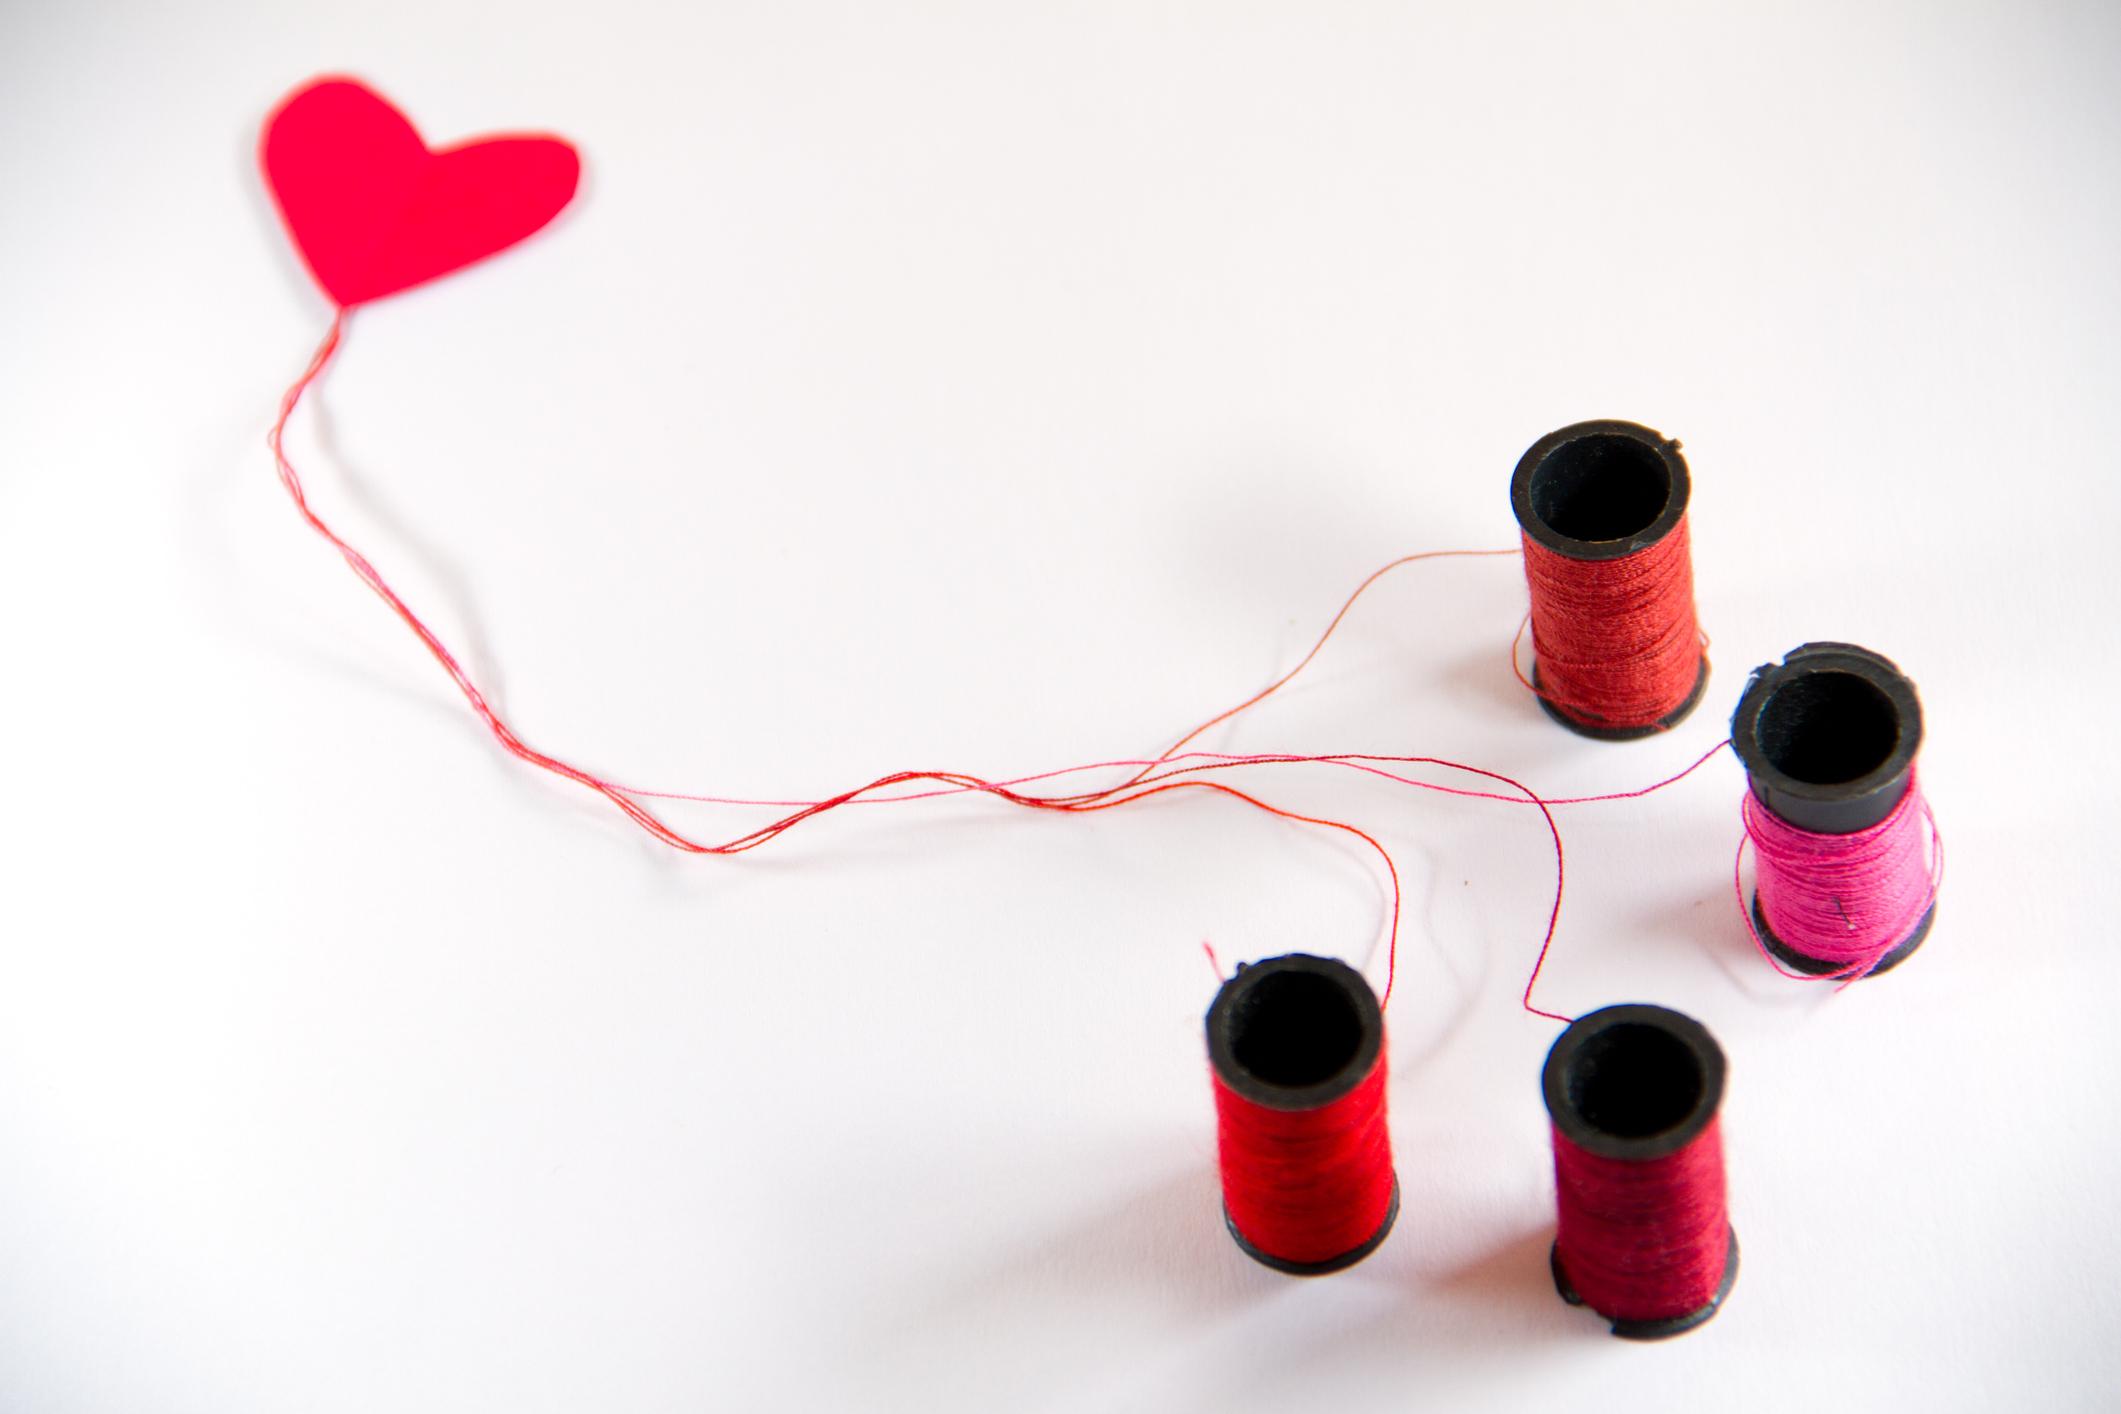 Let's Unite & We Love us & Love of spools